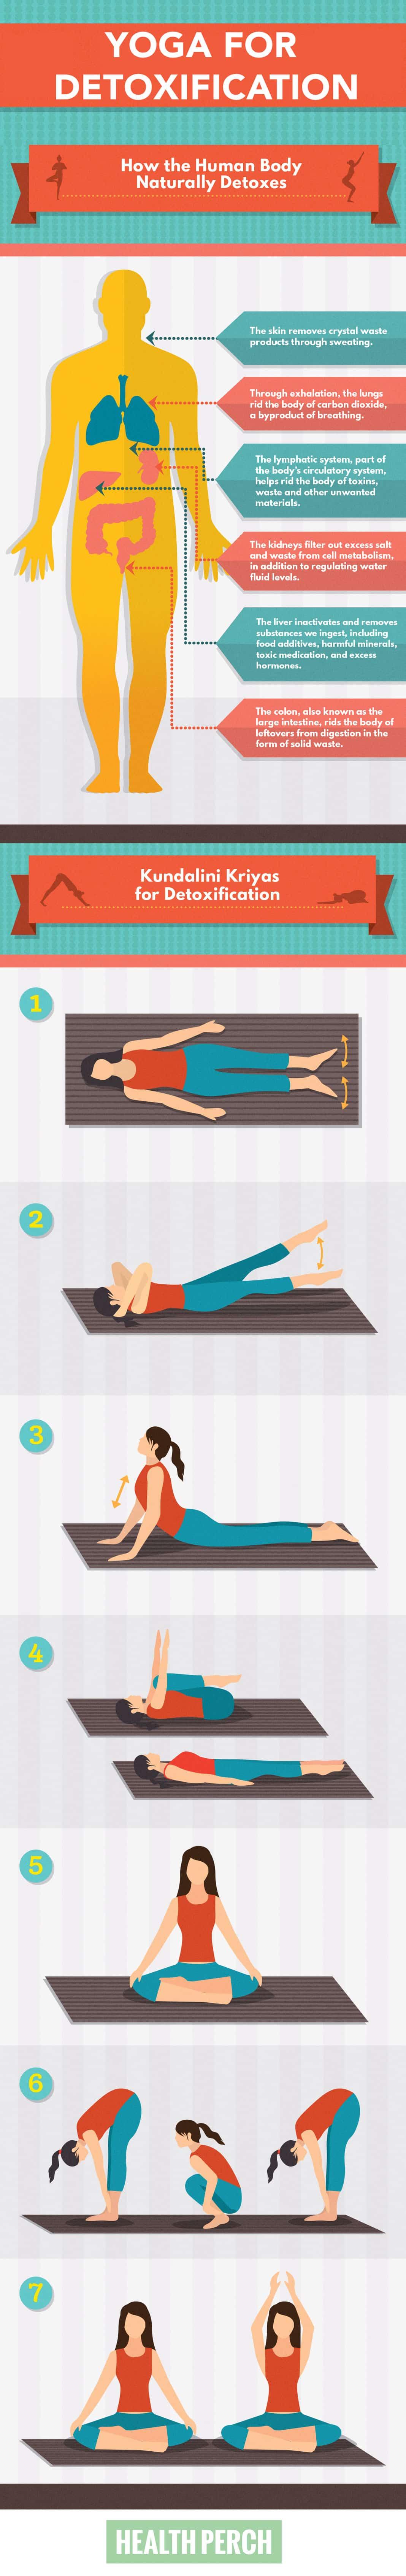 Yoga for Detoxification: Kundalini Kriyas to Detox